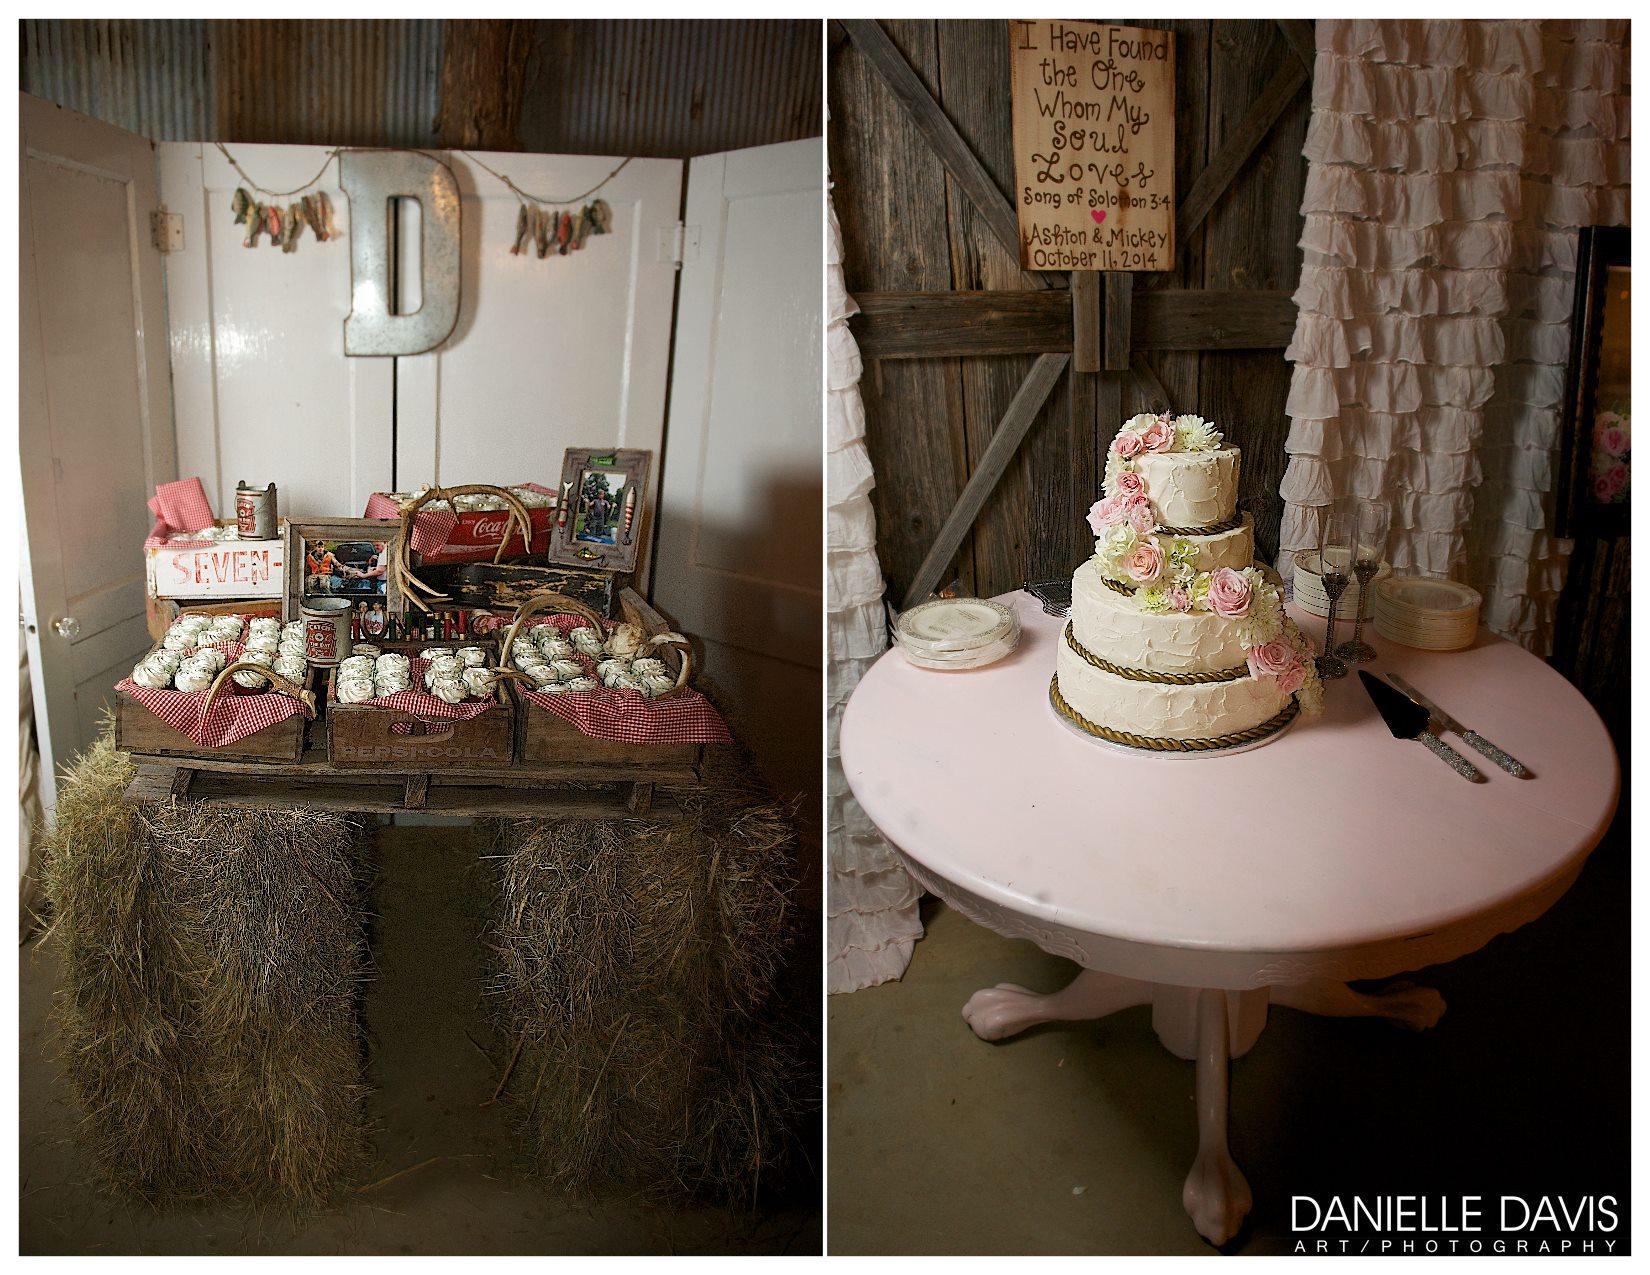 Danielle Davis Art/Photography